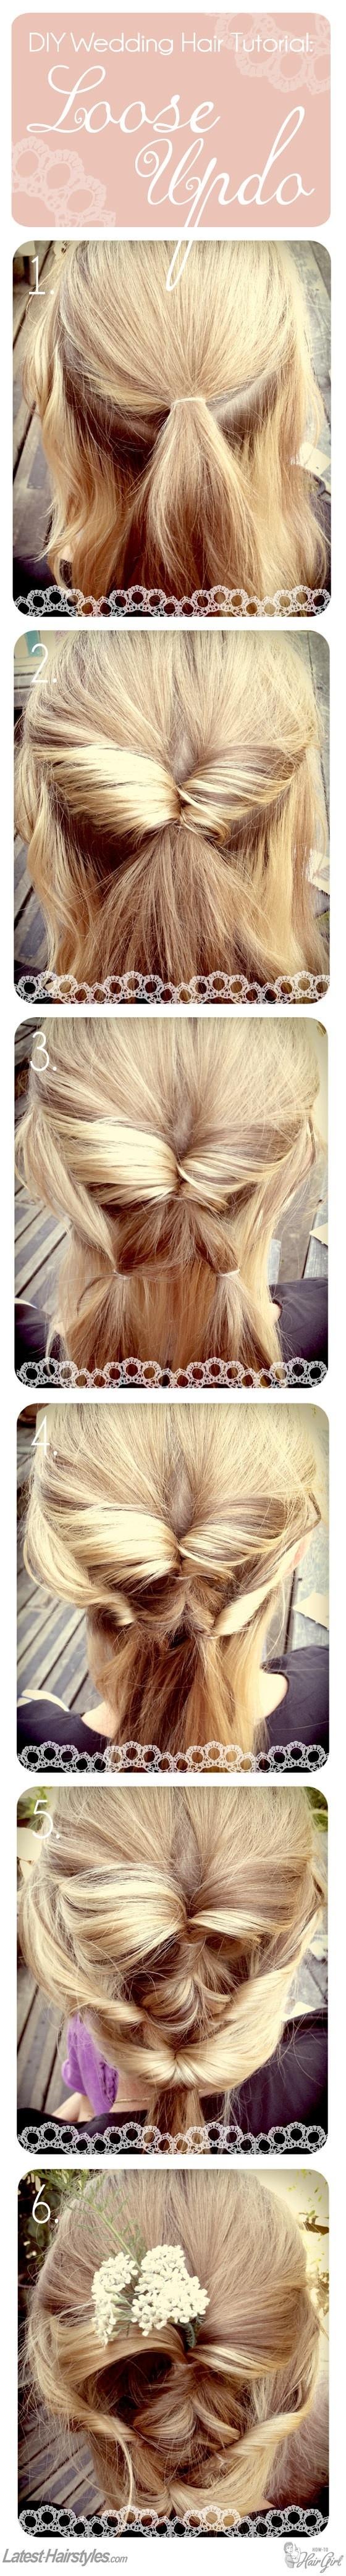 Beautiful hair steps.!